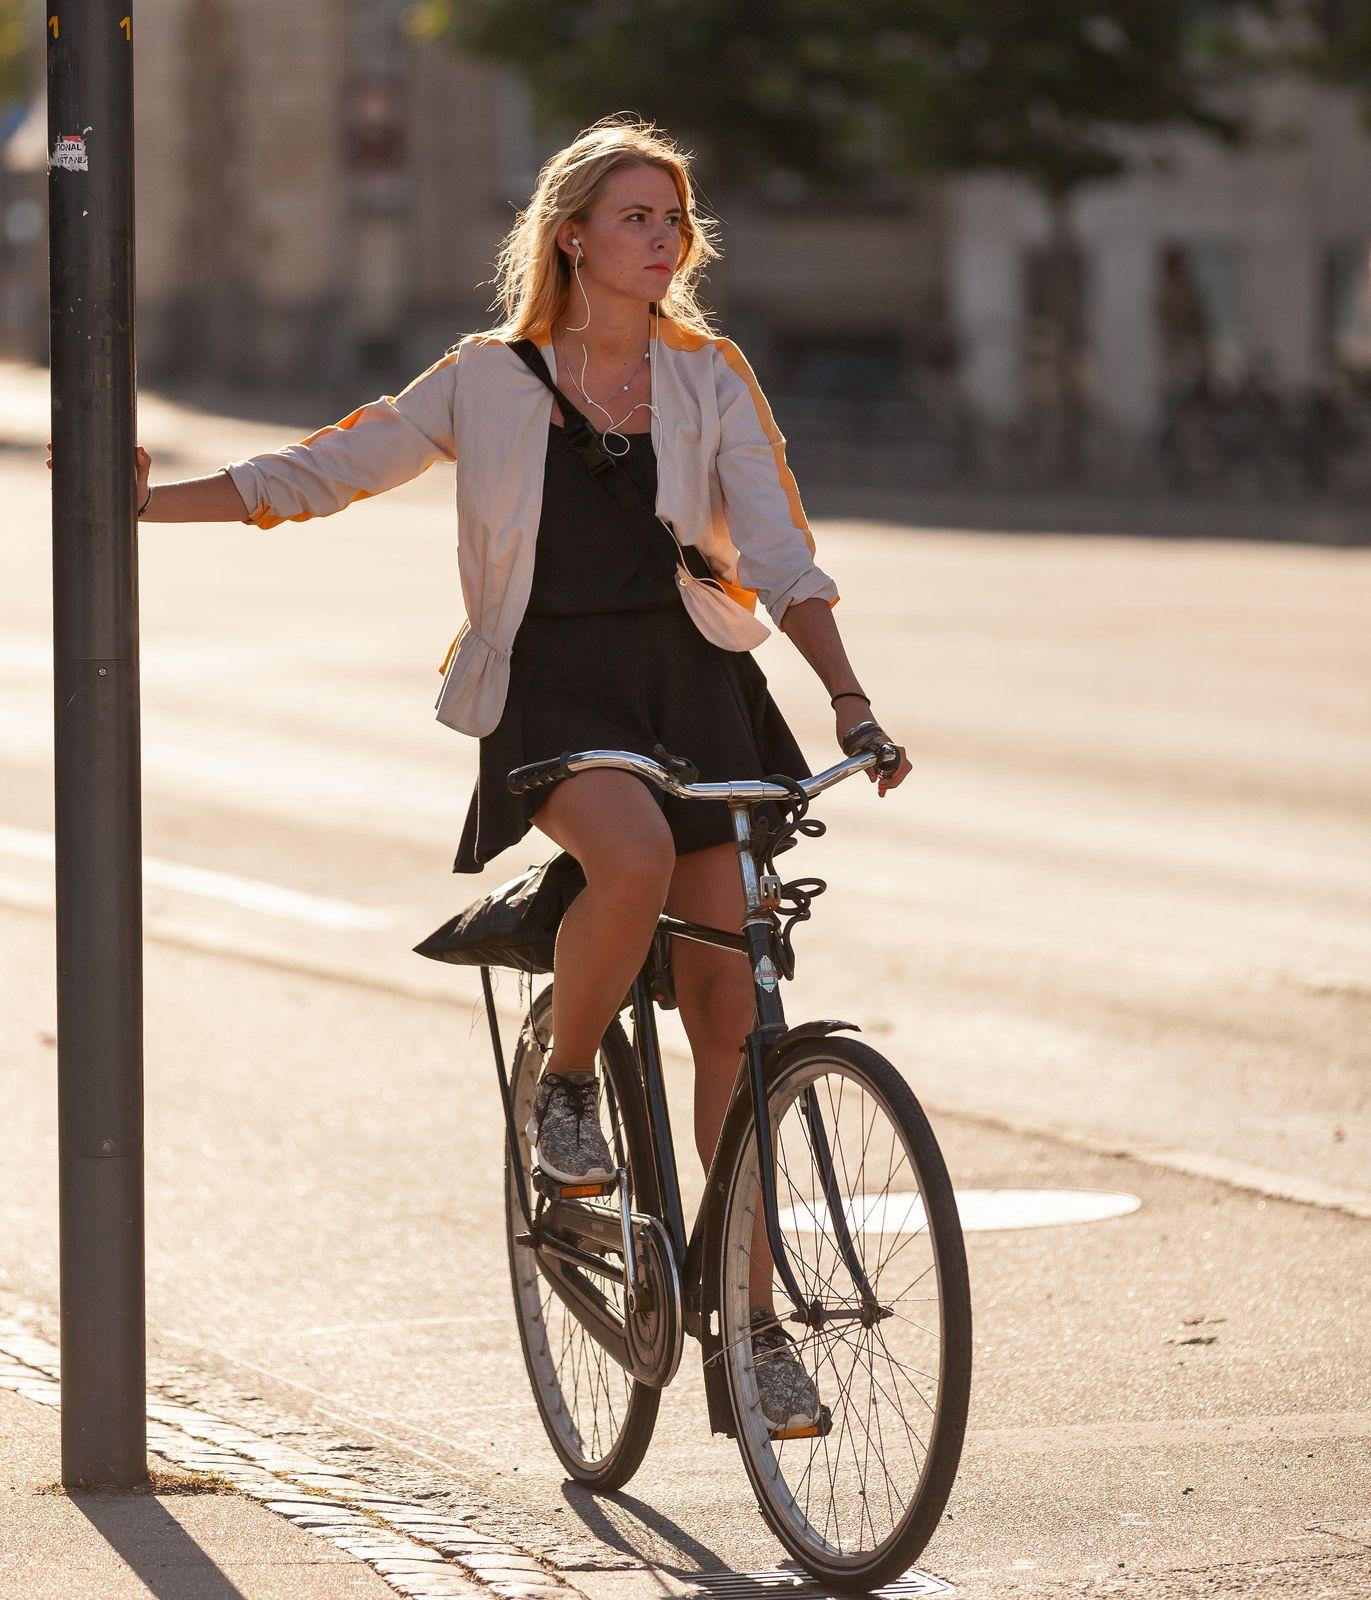 Copenhagen Bikehaven By Mellbin Bike Cycle Bicycle 2014 0266 Fahrrad Fahren Radfahren Fahrrad